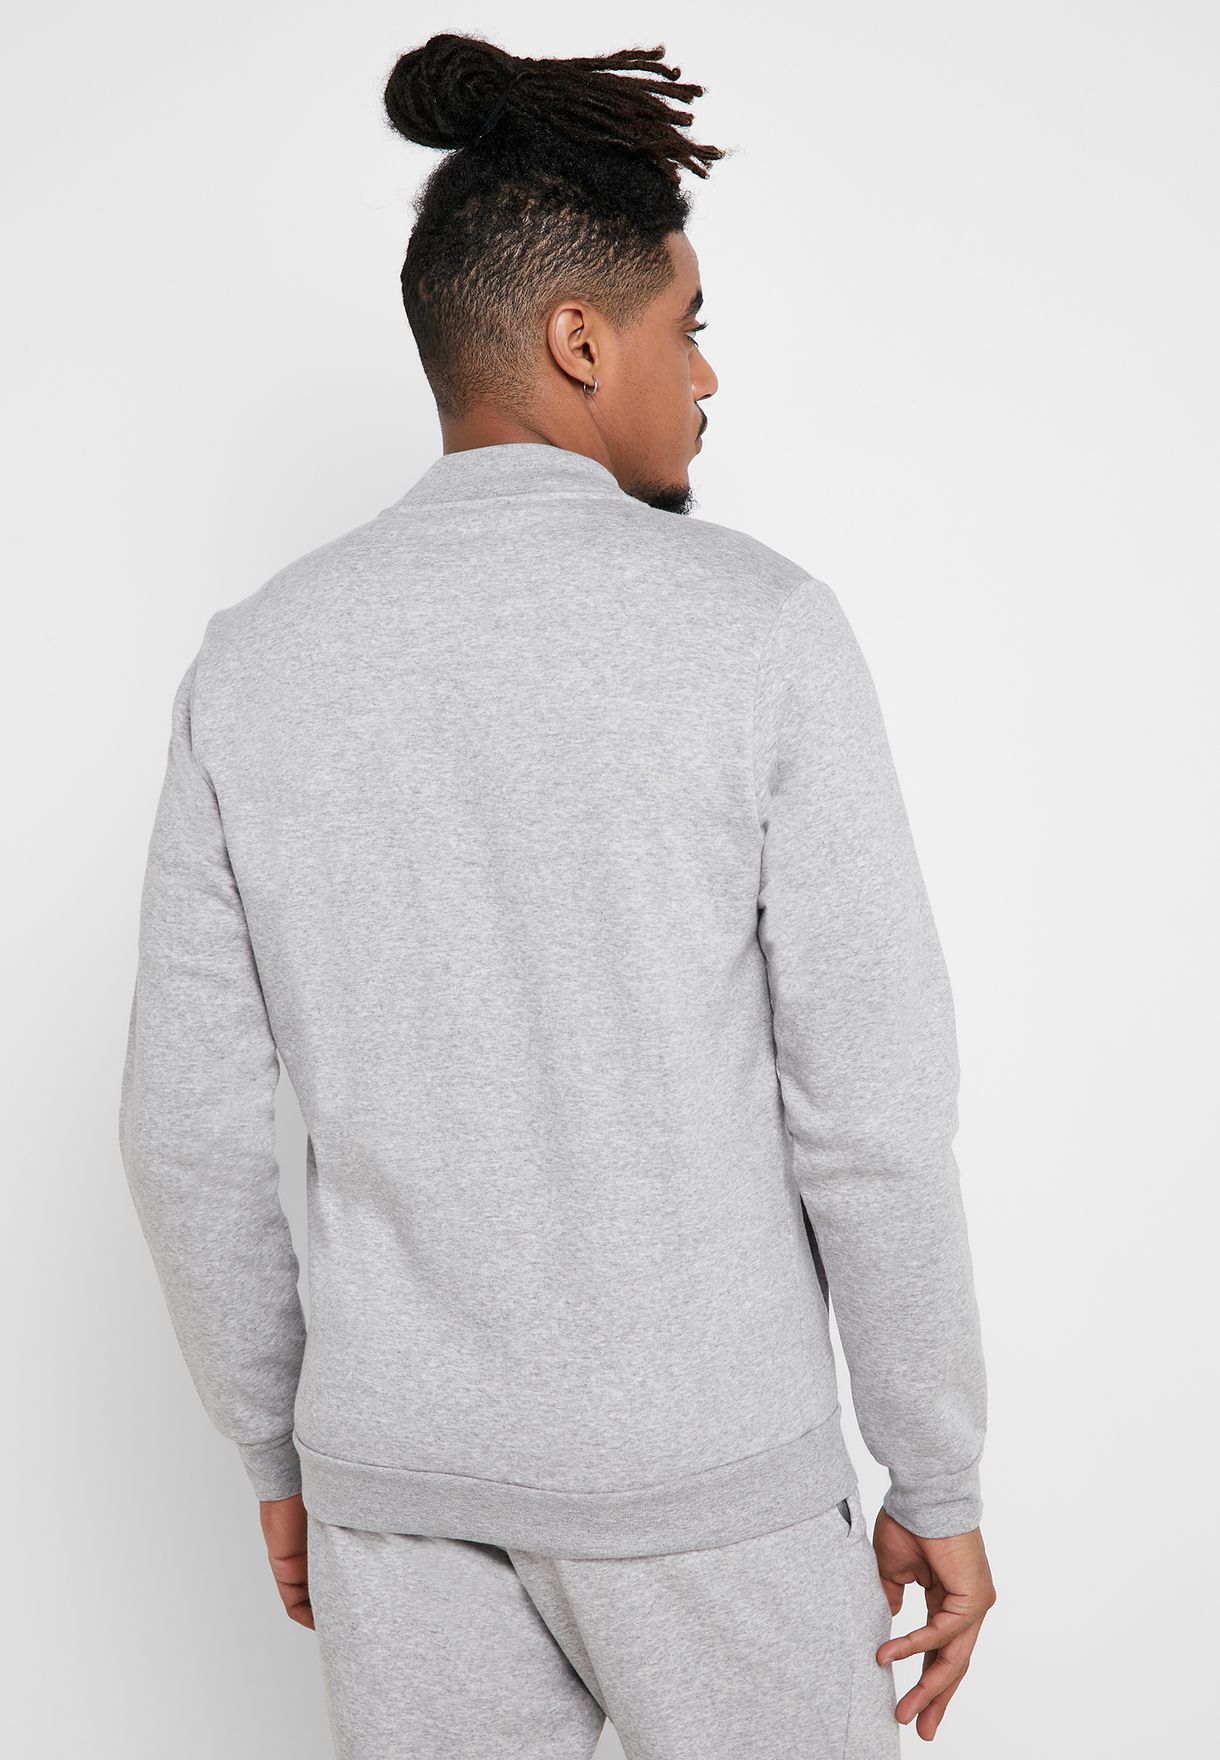 Essential Camo Linear Logo Sweatshirt